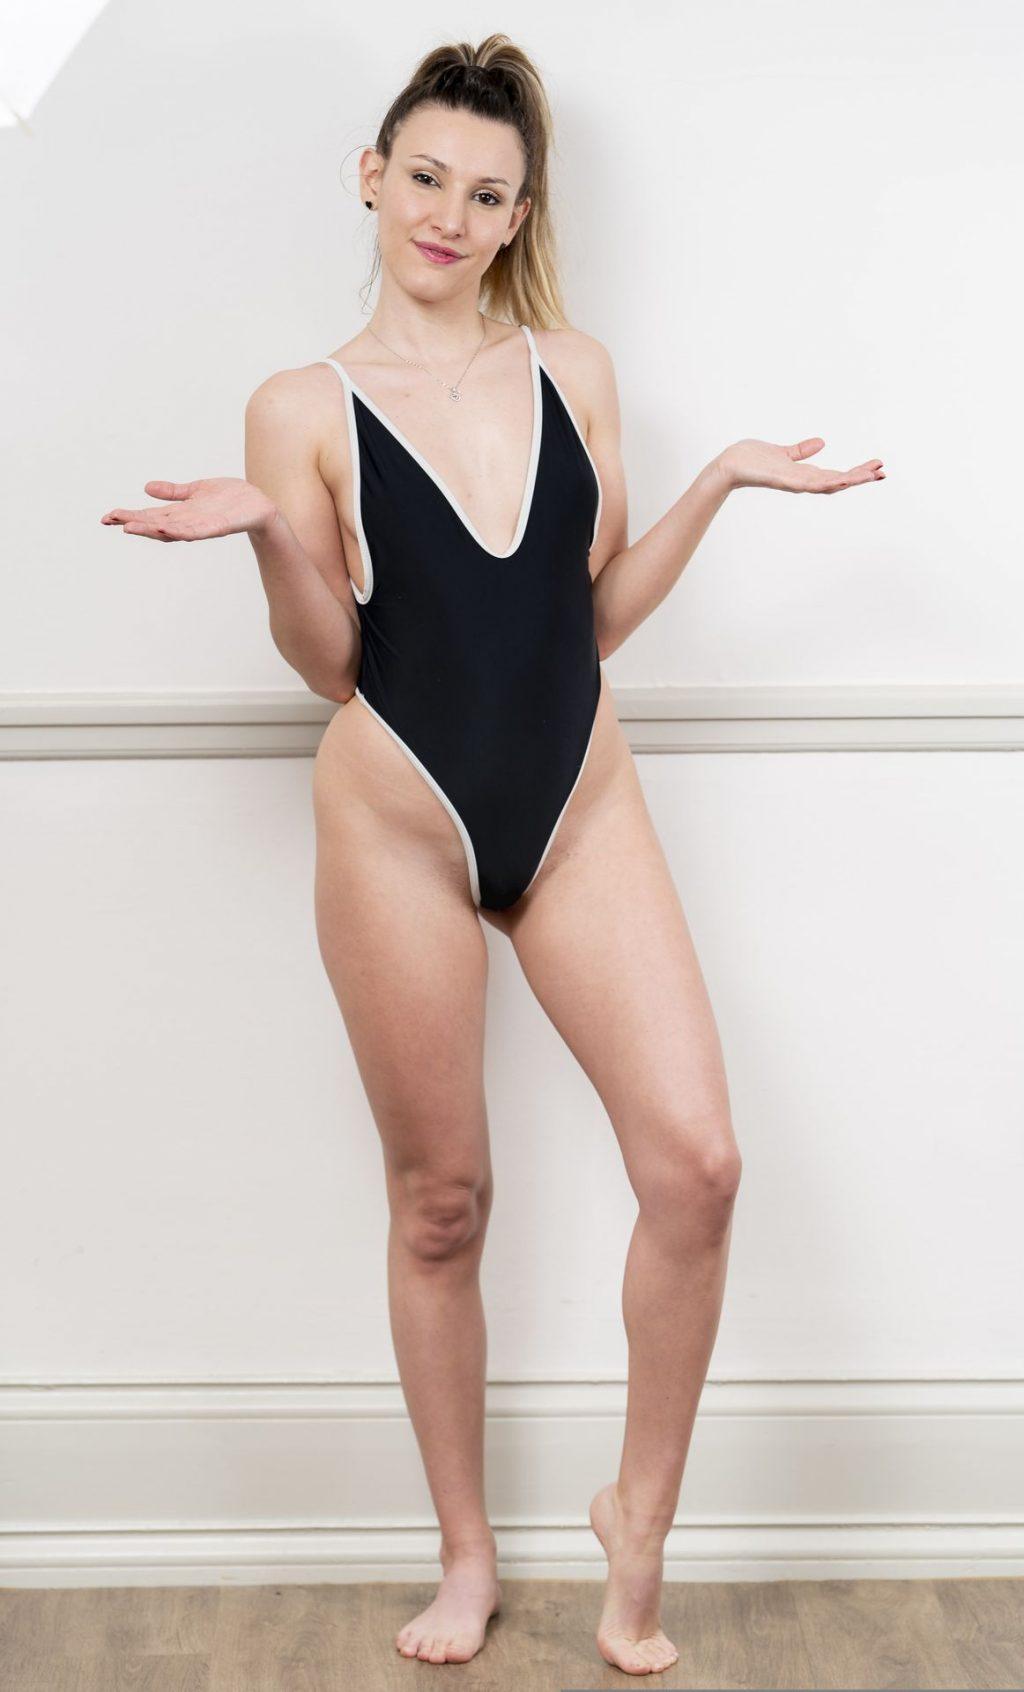 Nicole Bernardocchi Looks Hot in One-Piece (23 Photos)